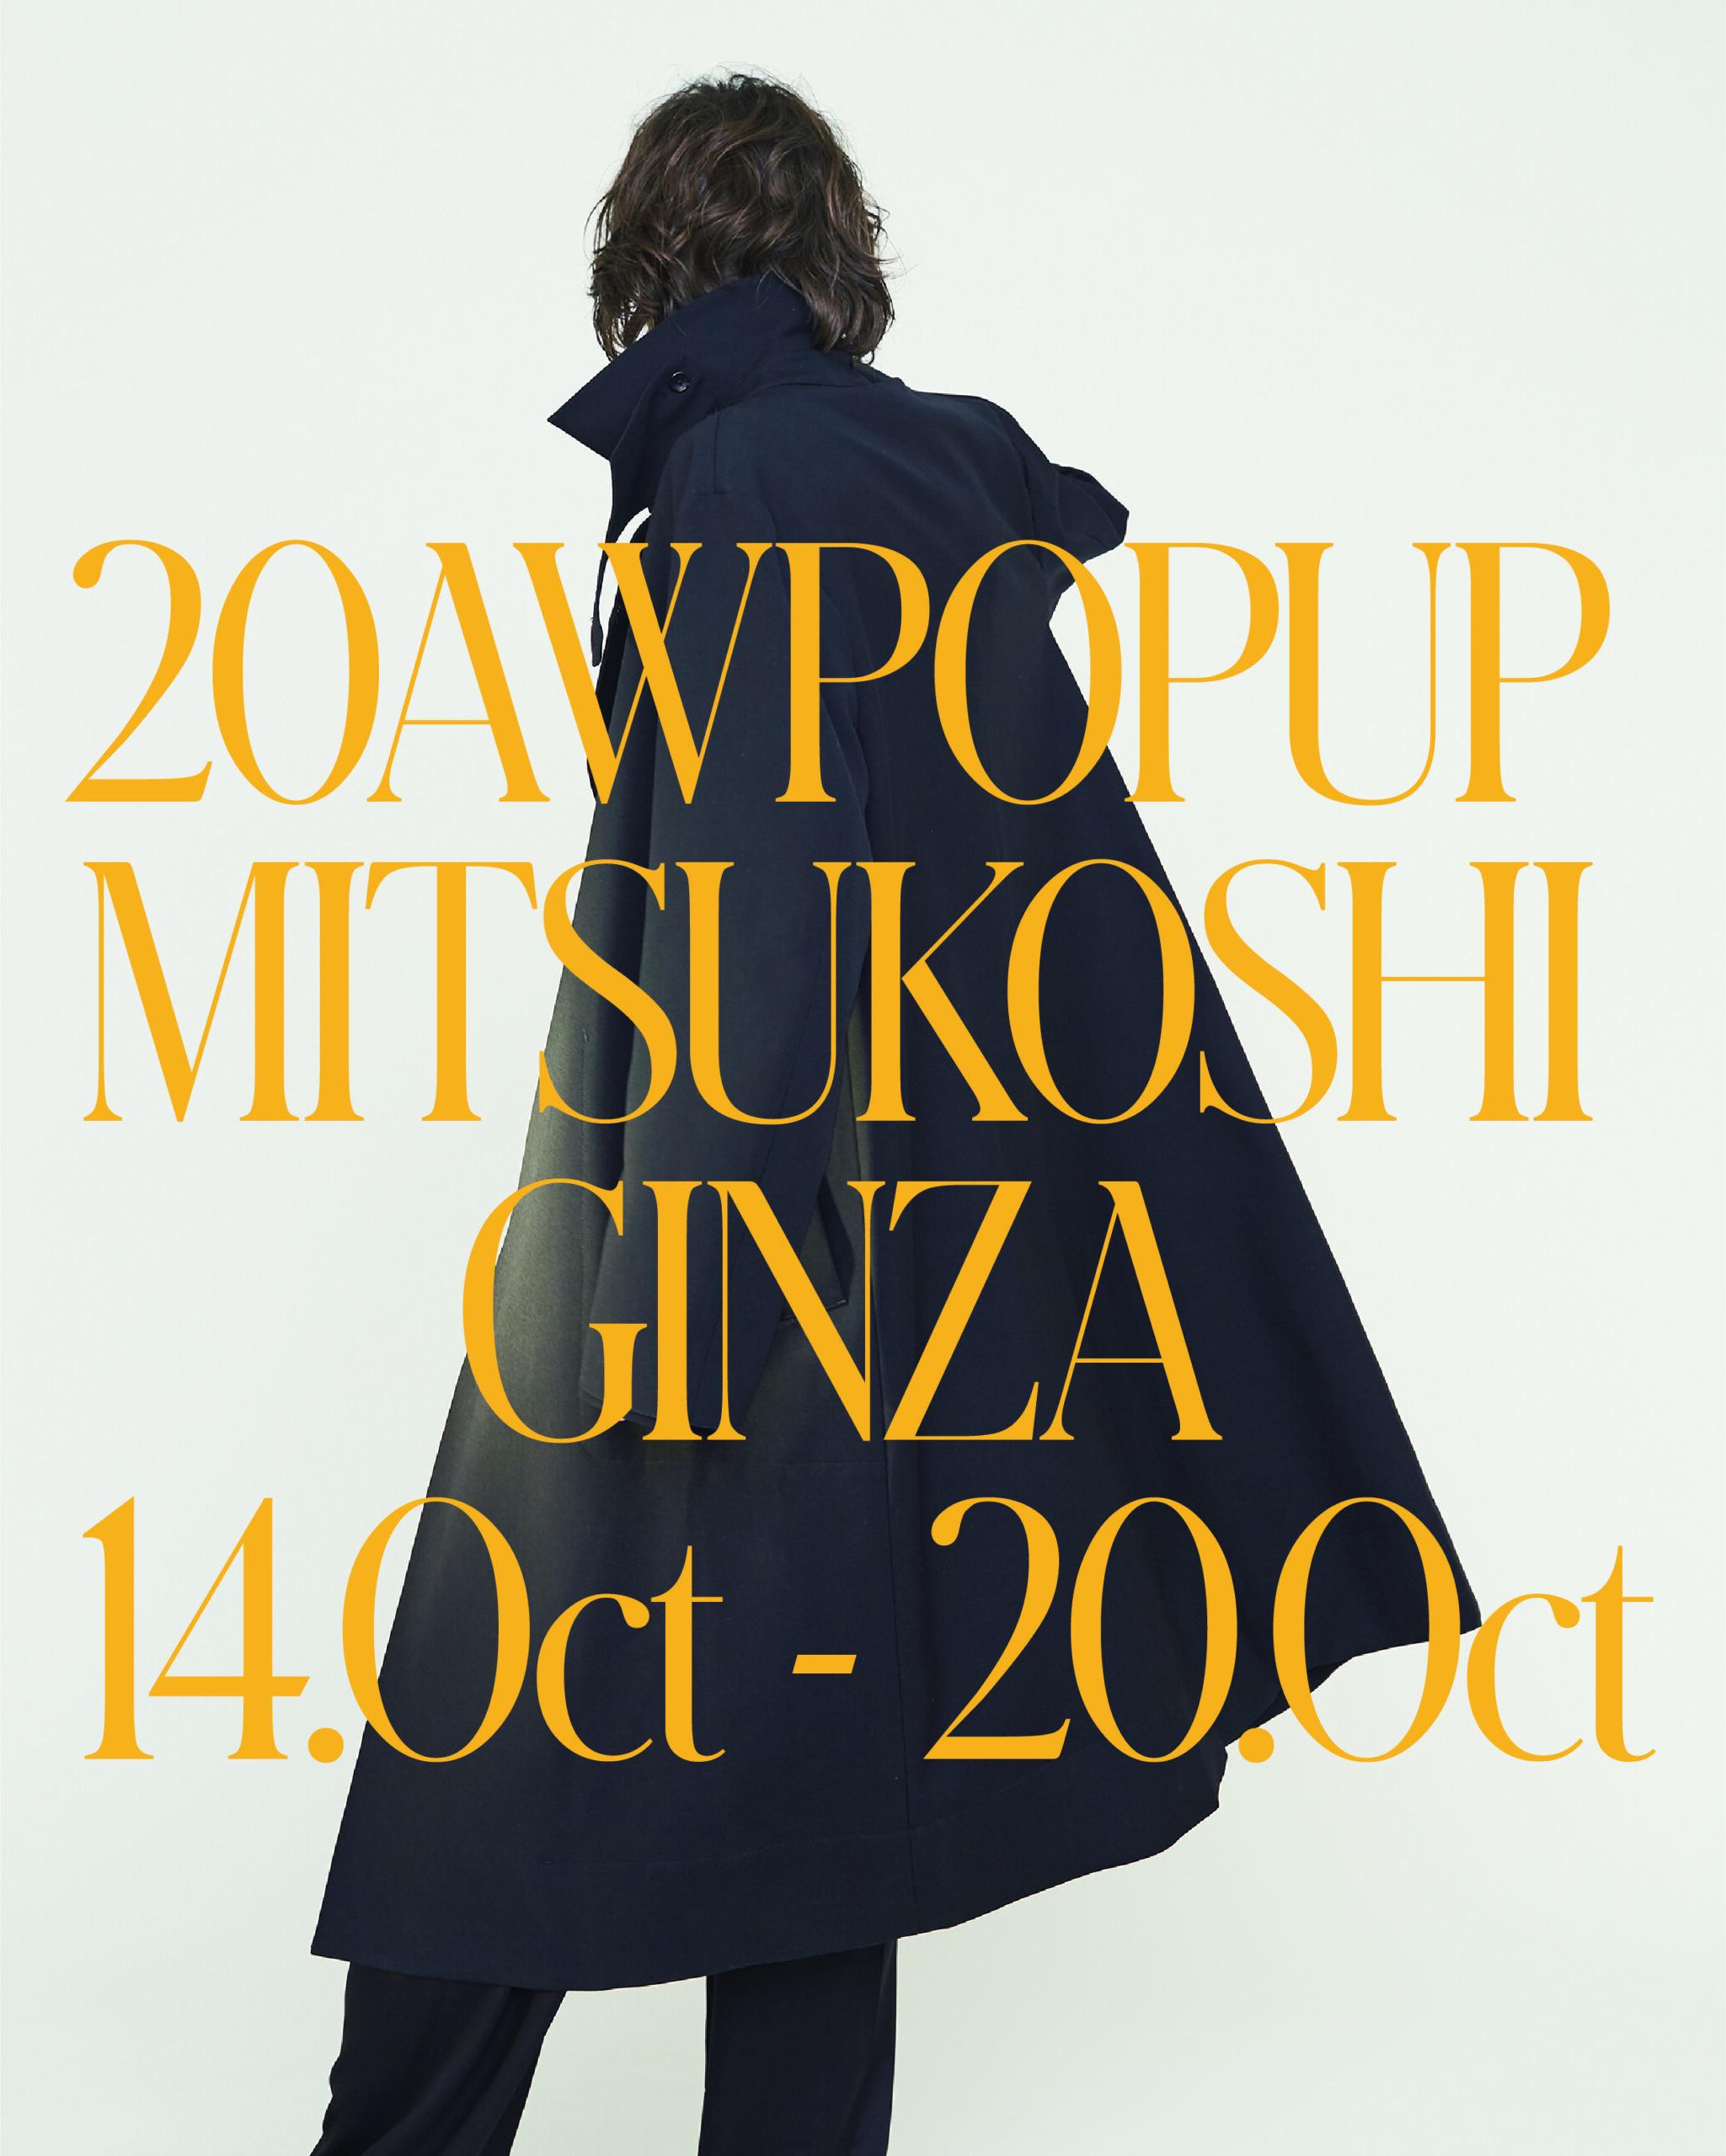 POP UP STORE AT MITSUKOSHI GINZA